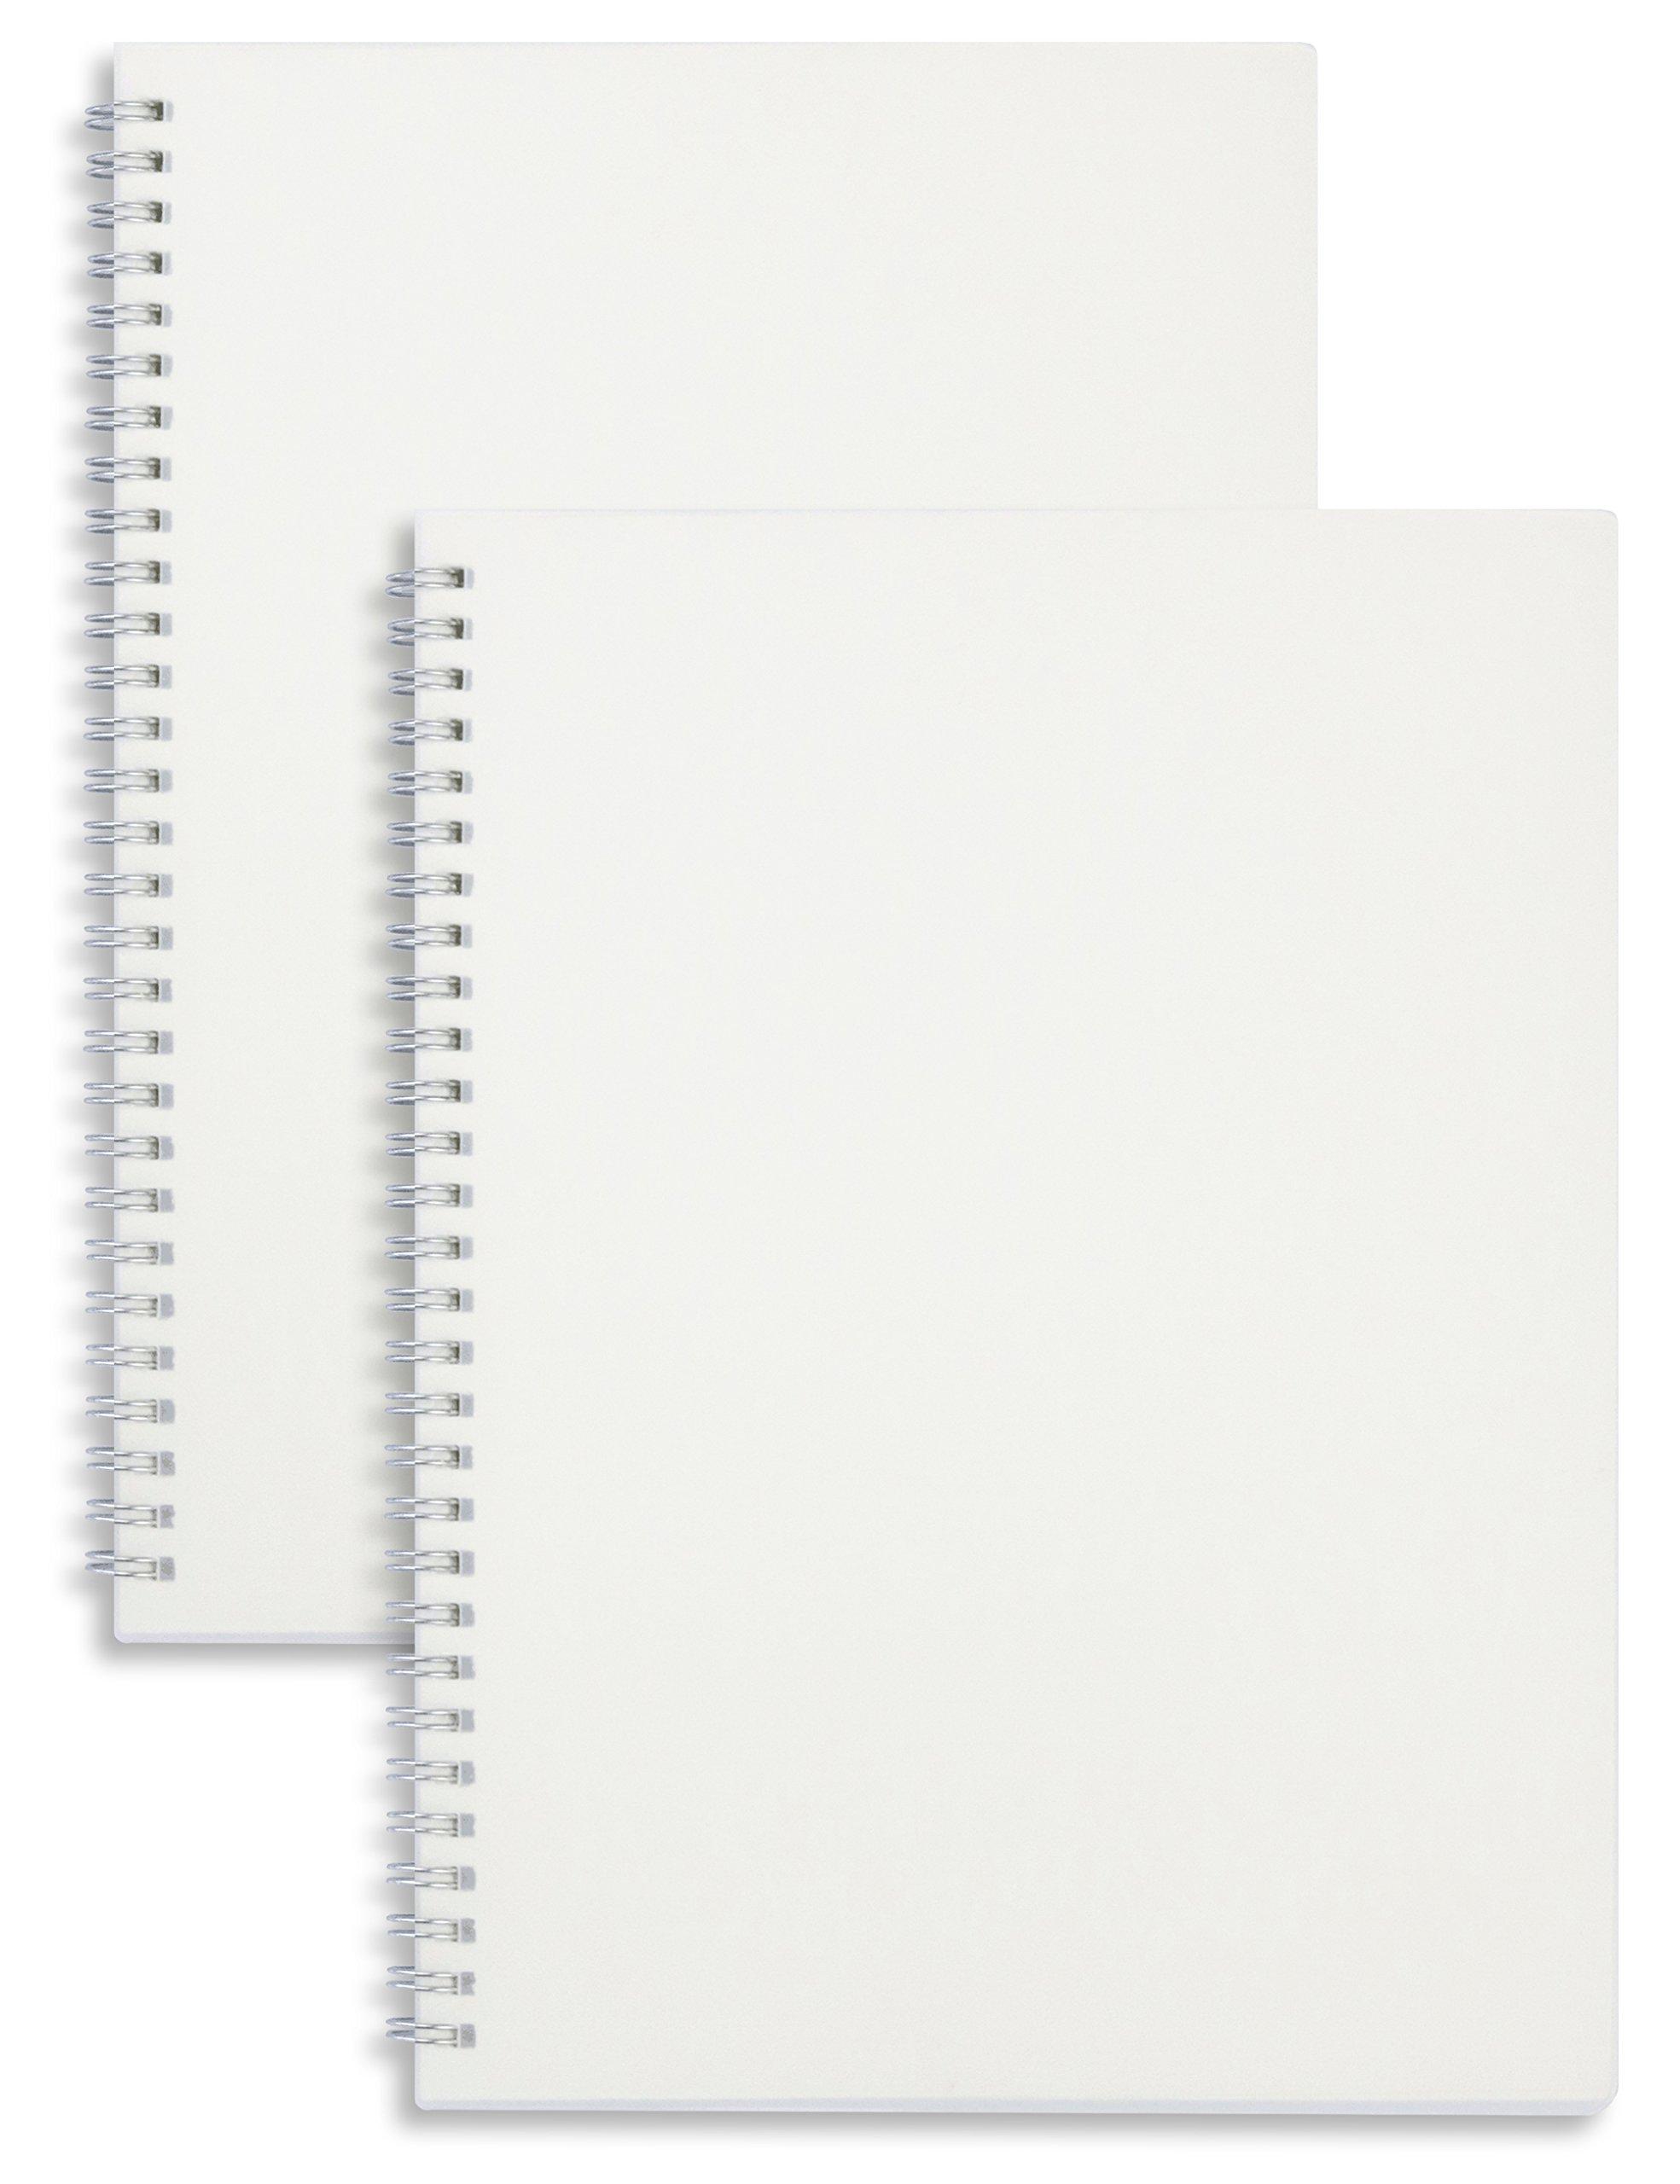 Miliko Transparent Hardcover B5 Blank Wirebound/Spiral Notebook/Journal Set-2 Per Pack, 7.1''x10''(Blank)